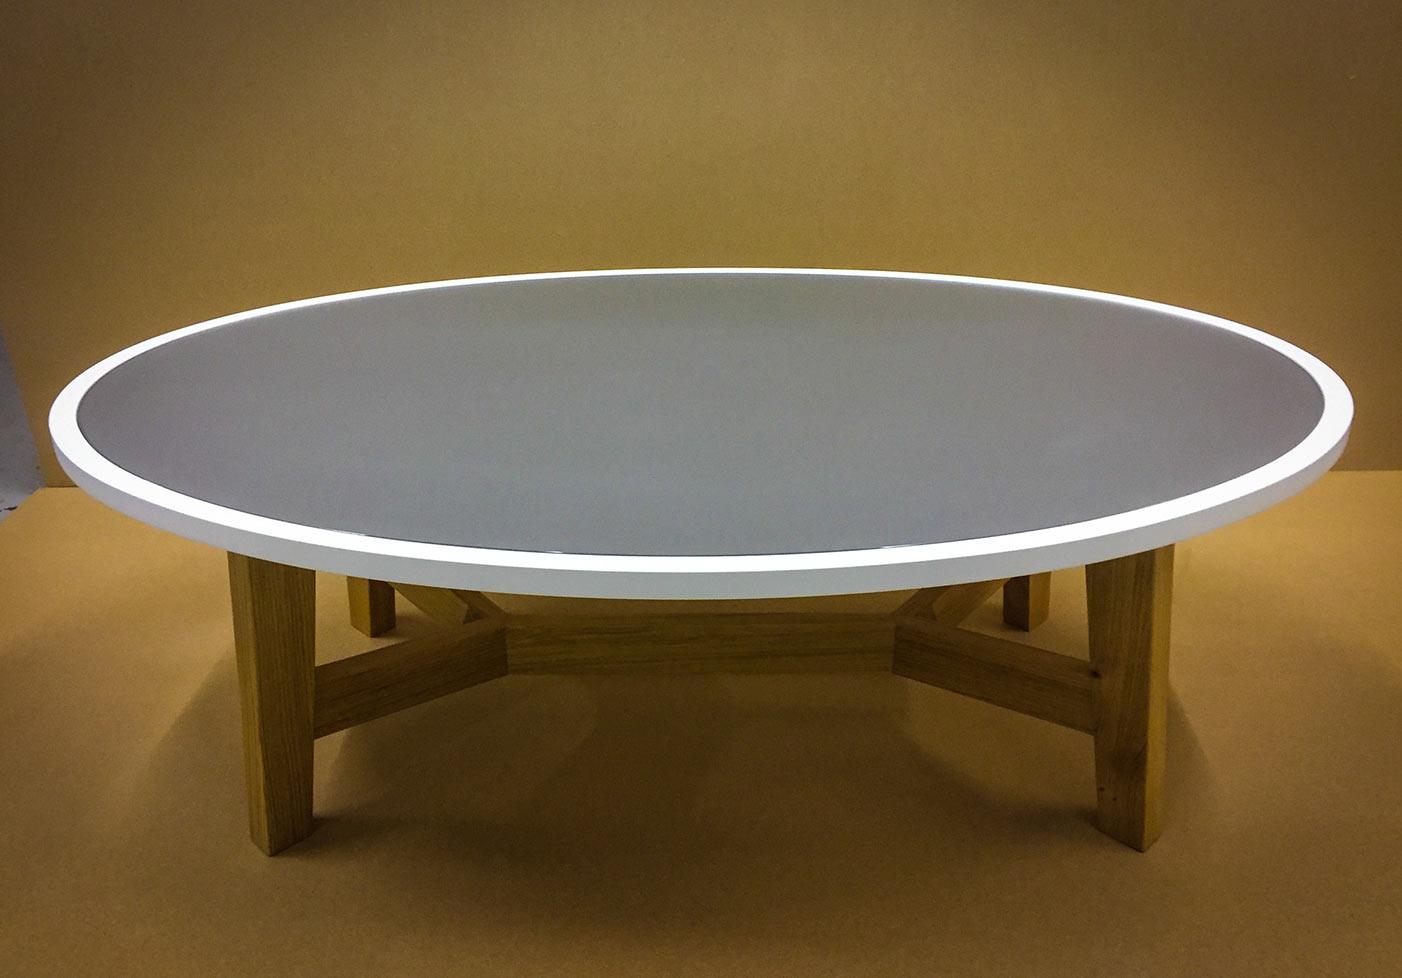 Free Standing Furniture | Jack Hyams design & Manufacture